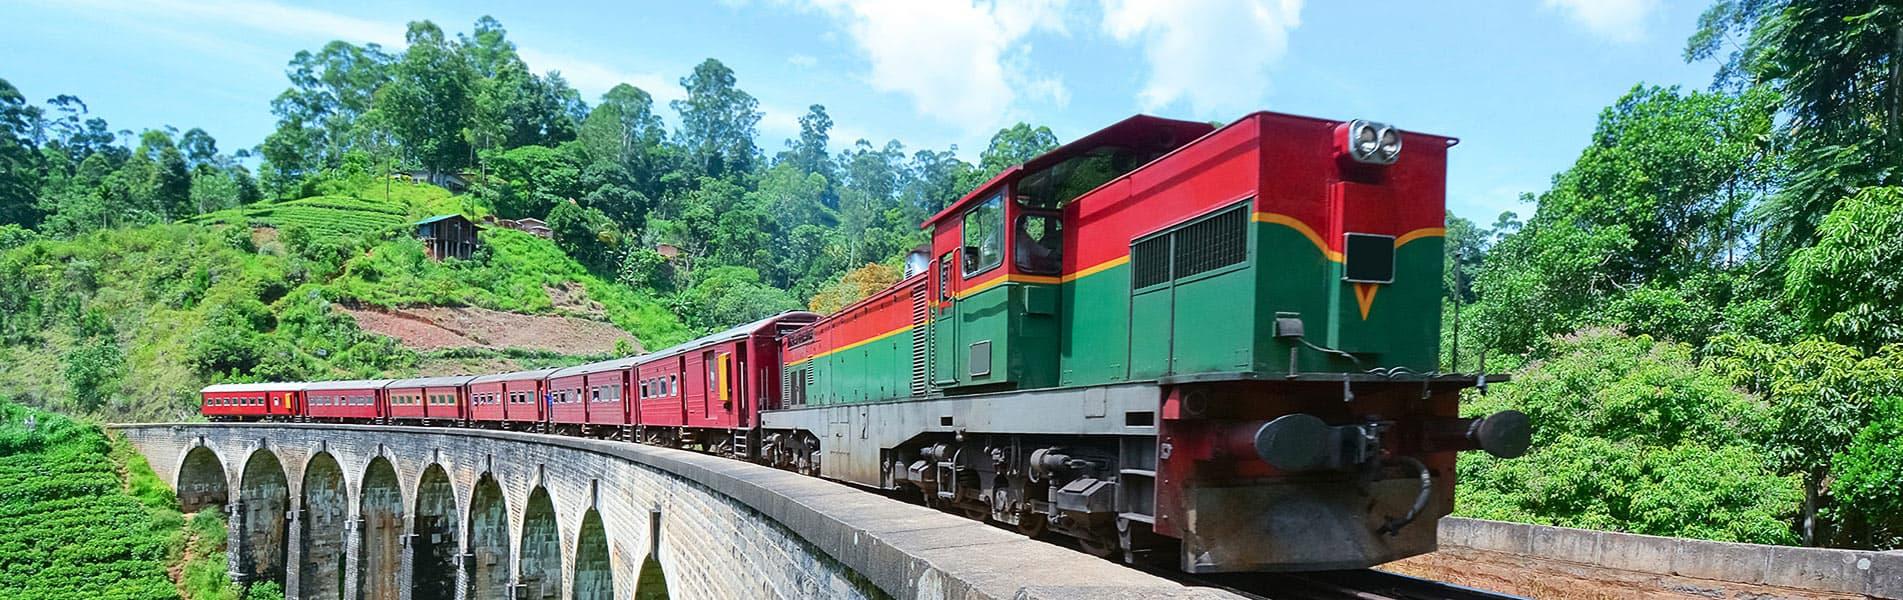 Rail road in Sri Lanka